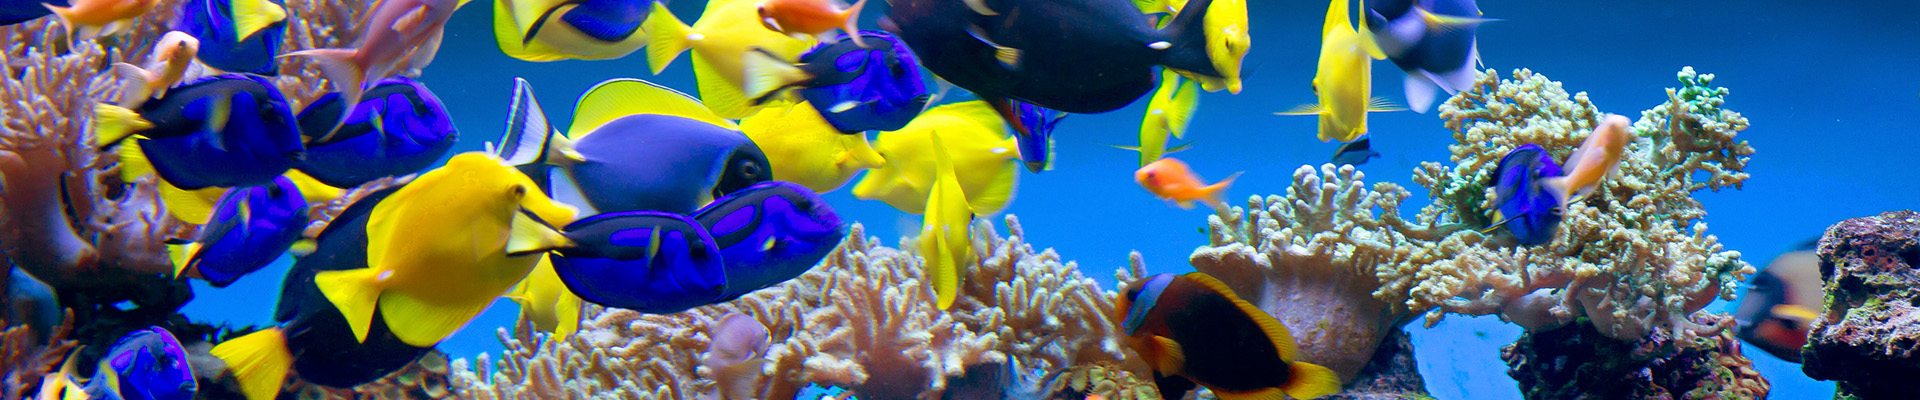 biouv-visuel-aquariums_2